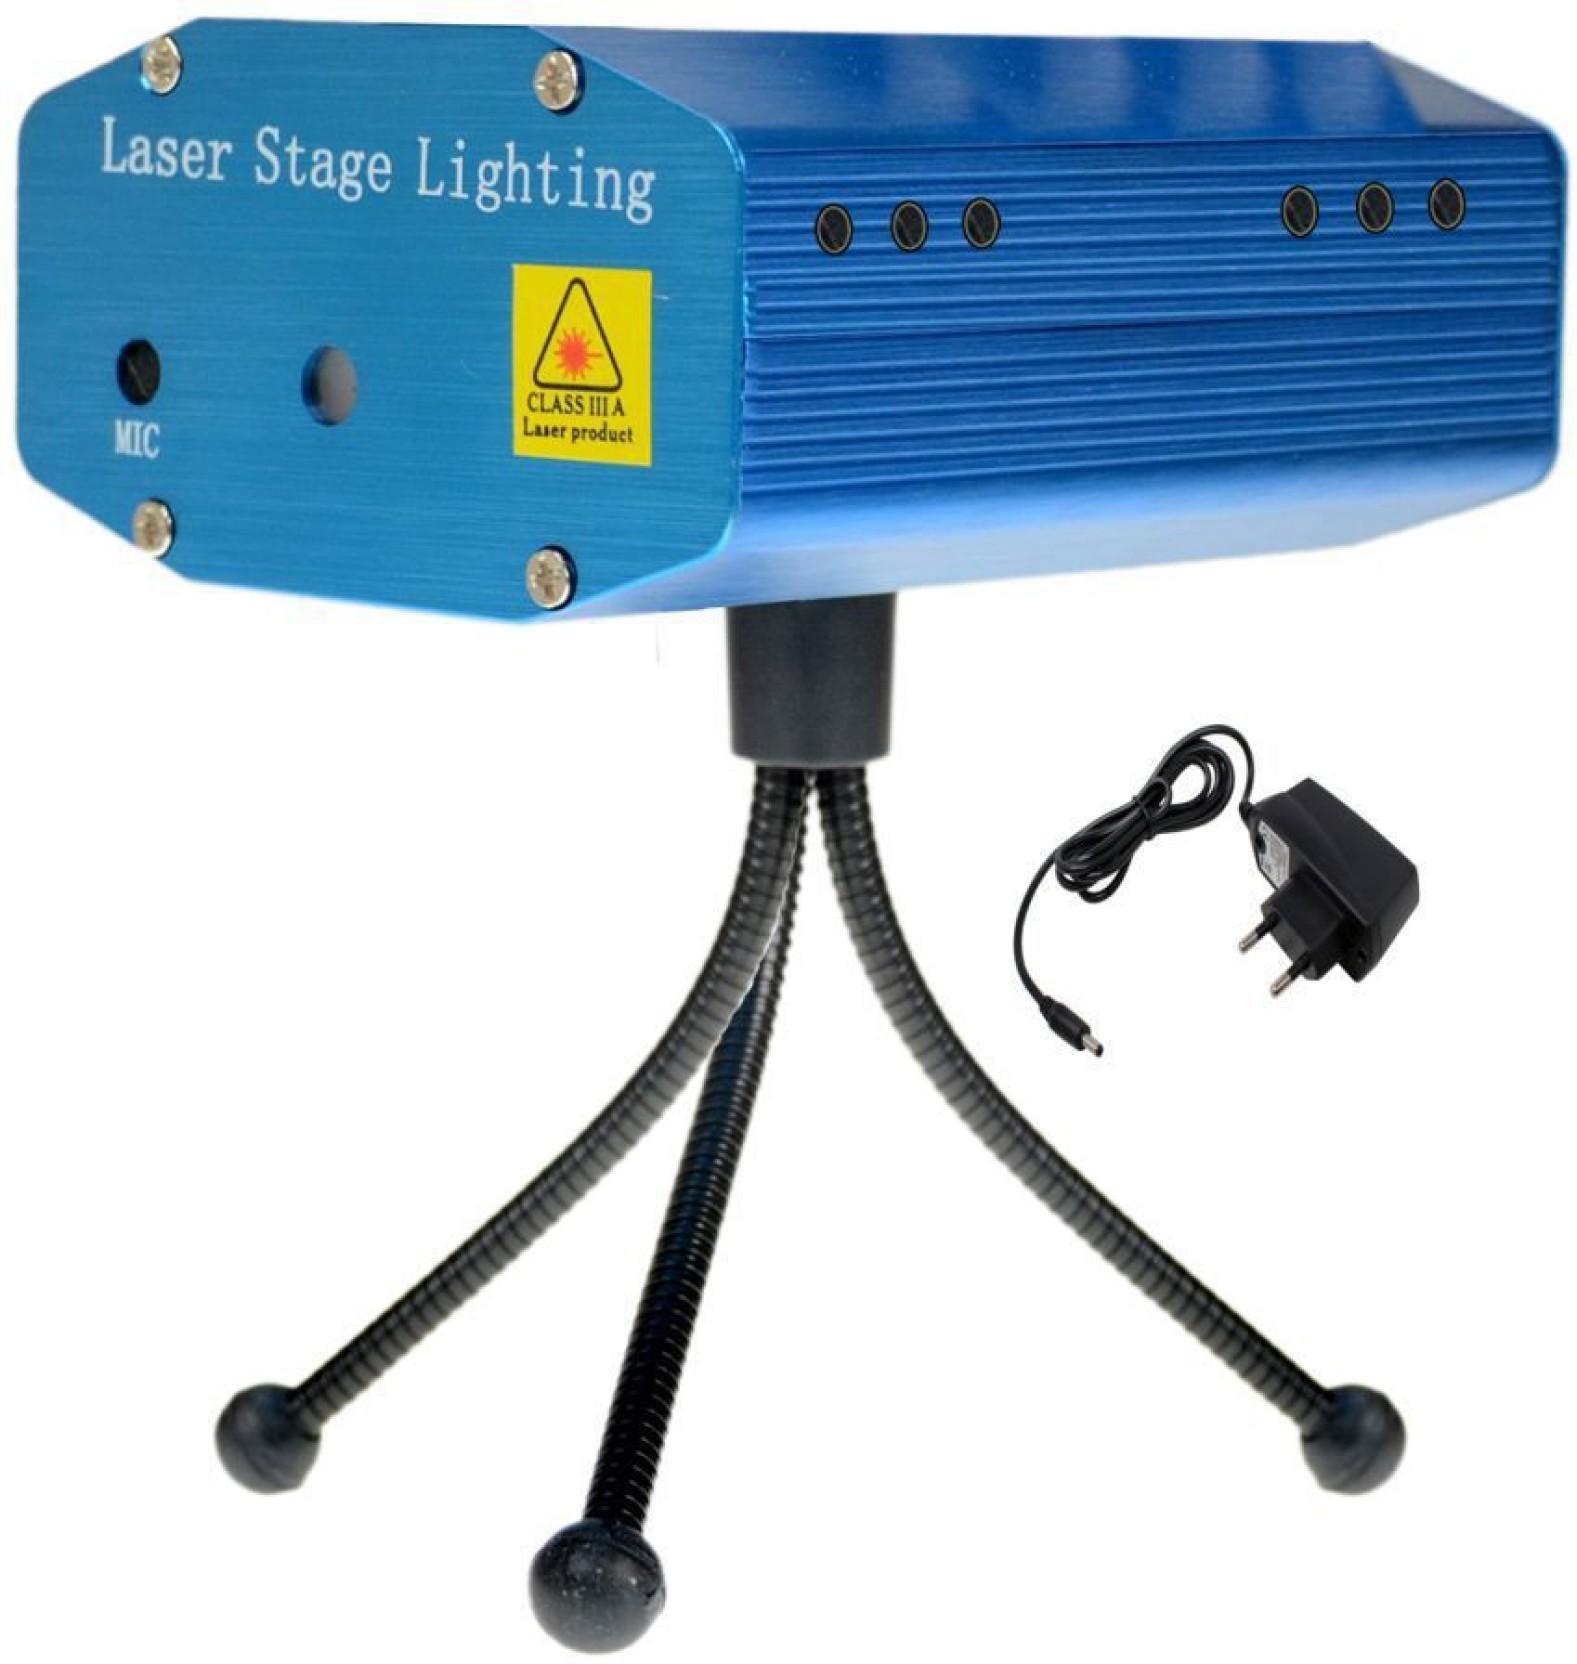 Kidland Multi Pattern Laser Mini Disco Light Projector Stage Multicolor Ampamp Tripod Blue Lighting Ball Diameter 10 Add To Cart